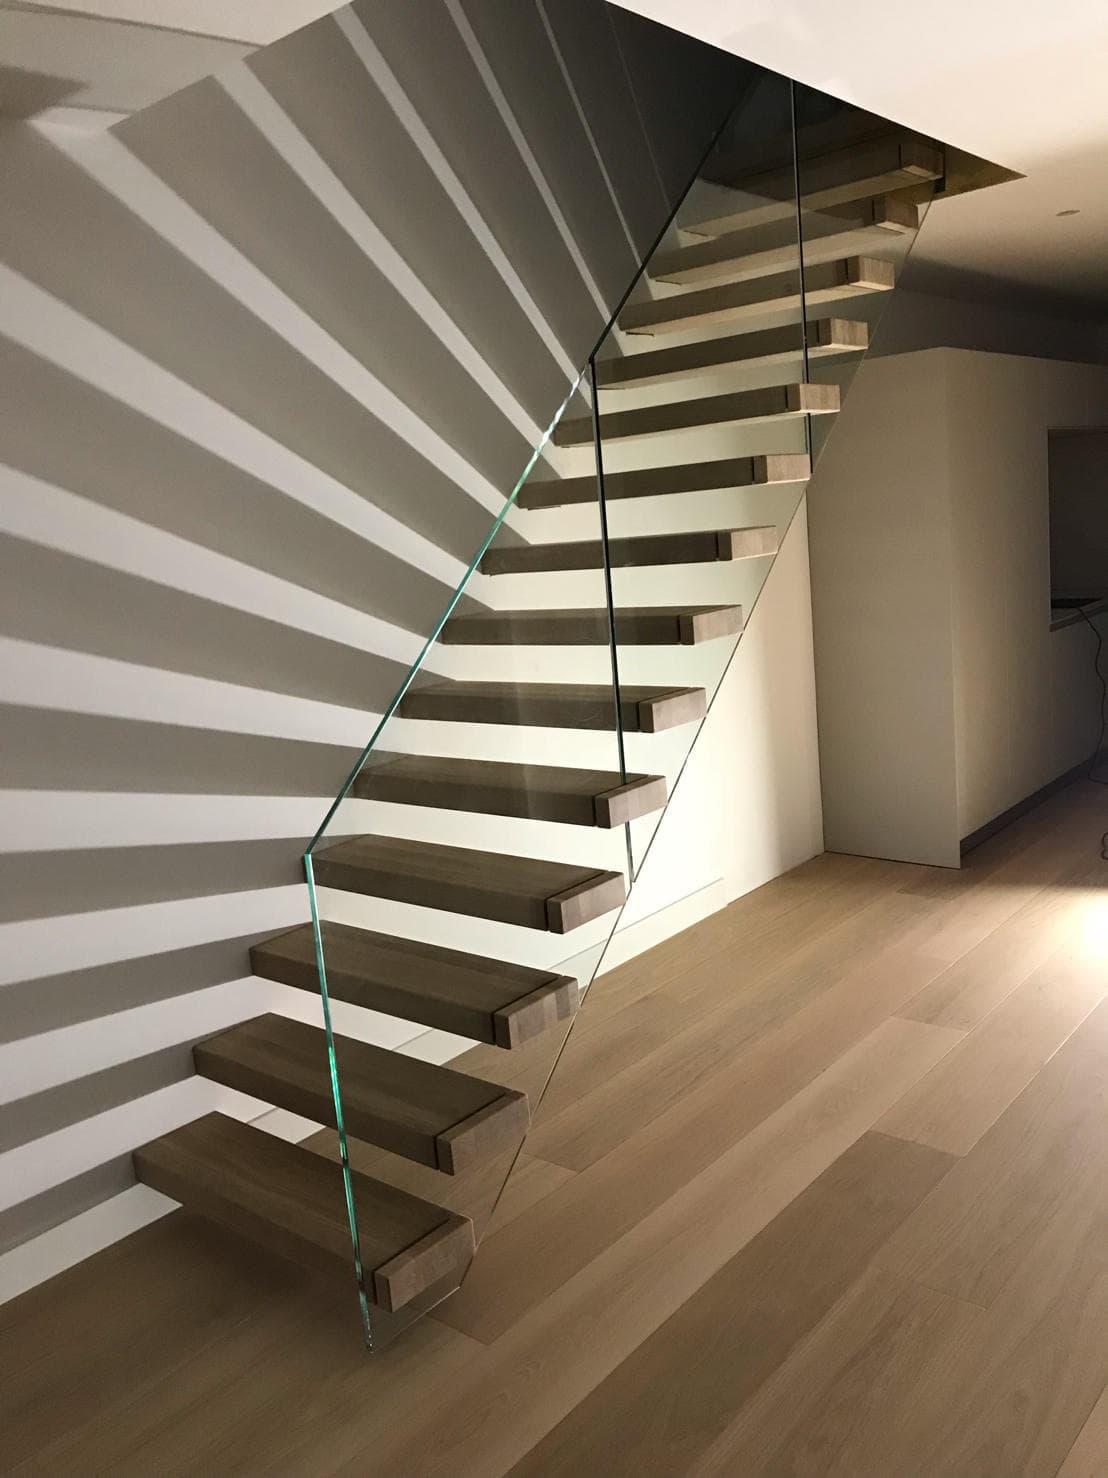 zt20a zwevende trap met lichteffect